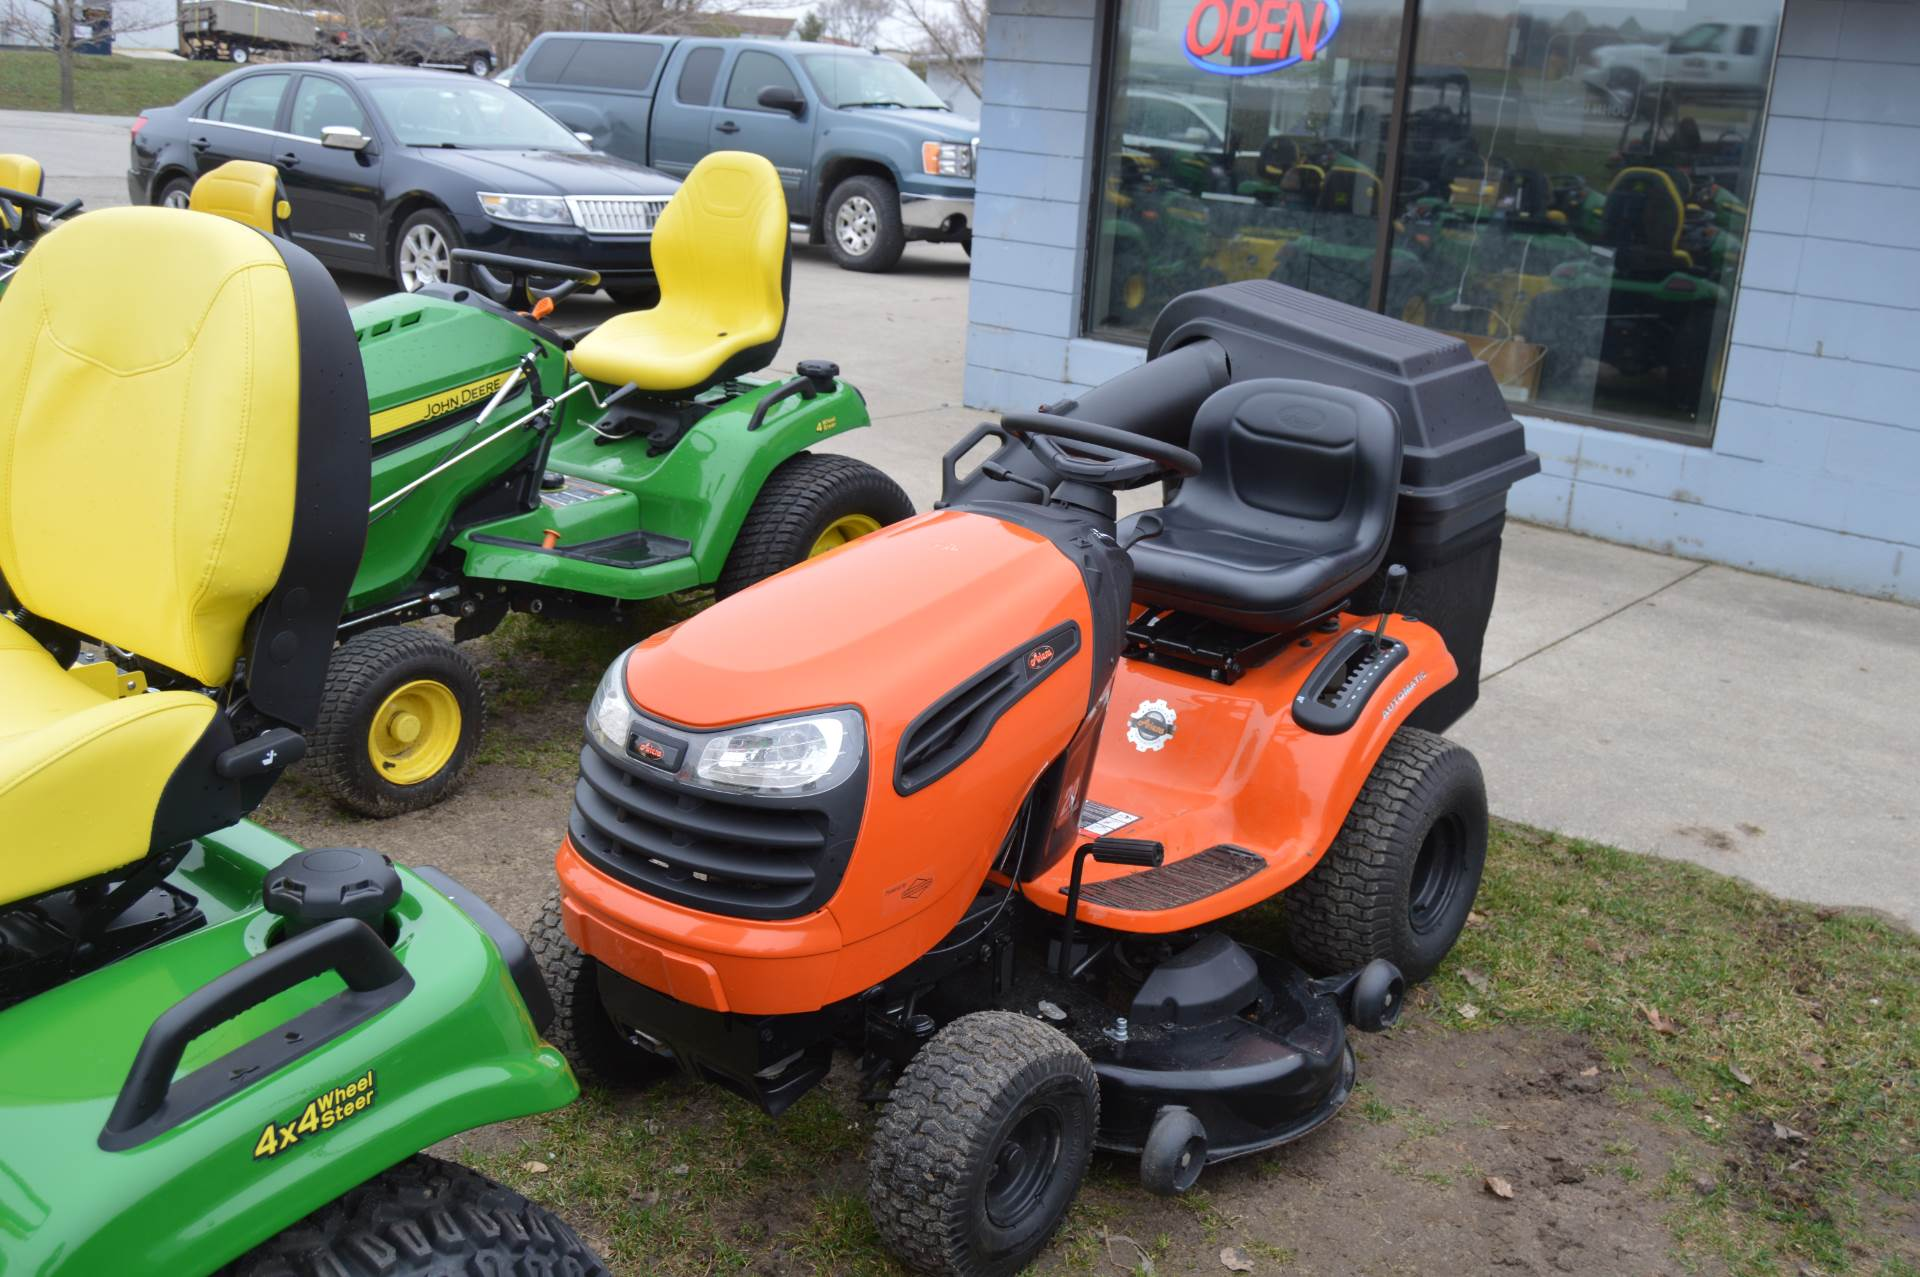 2015 Ariens Lawn Tractor 46 in Traverse City, Michigan